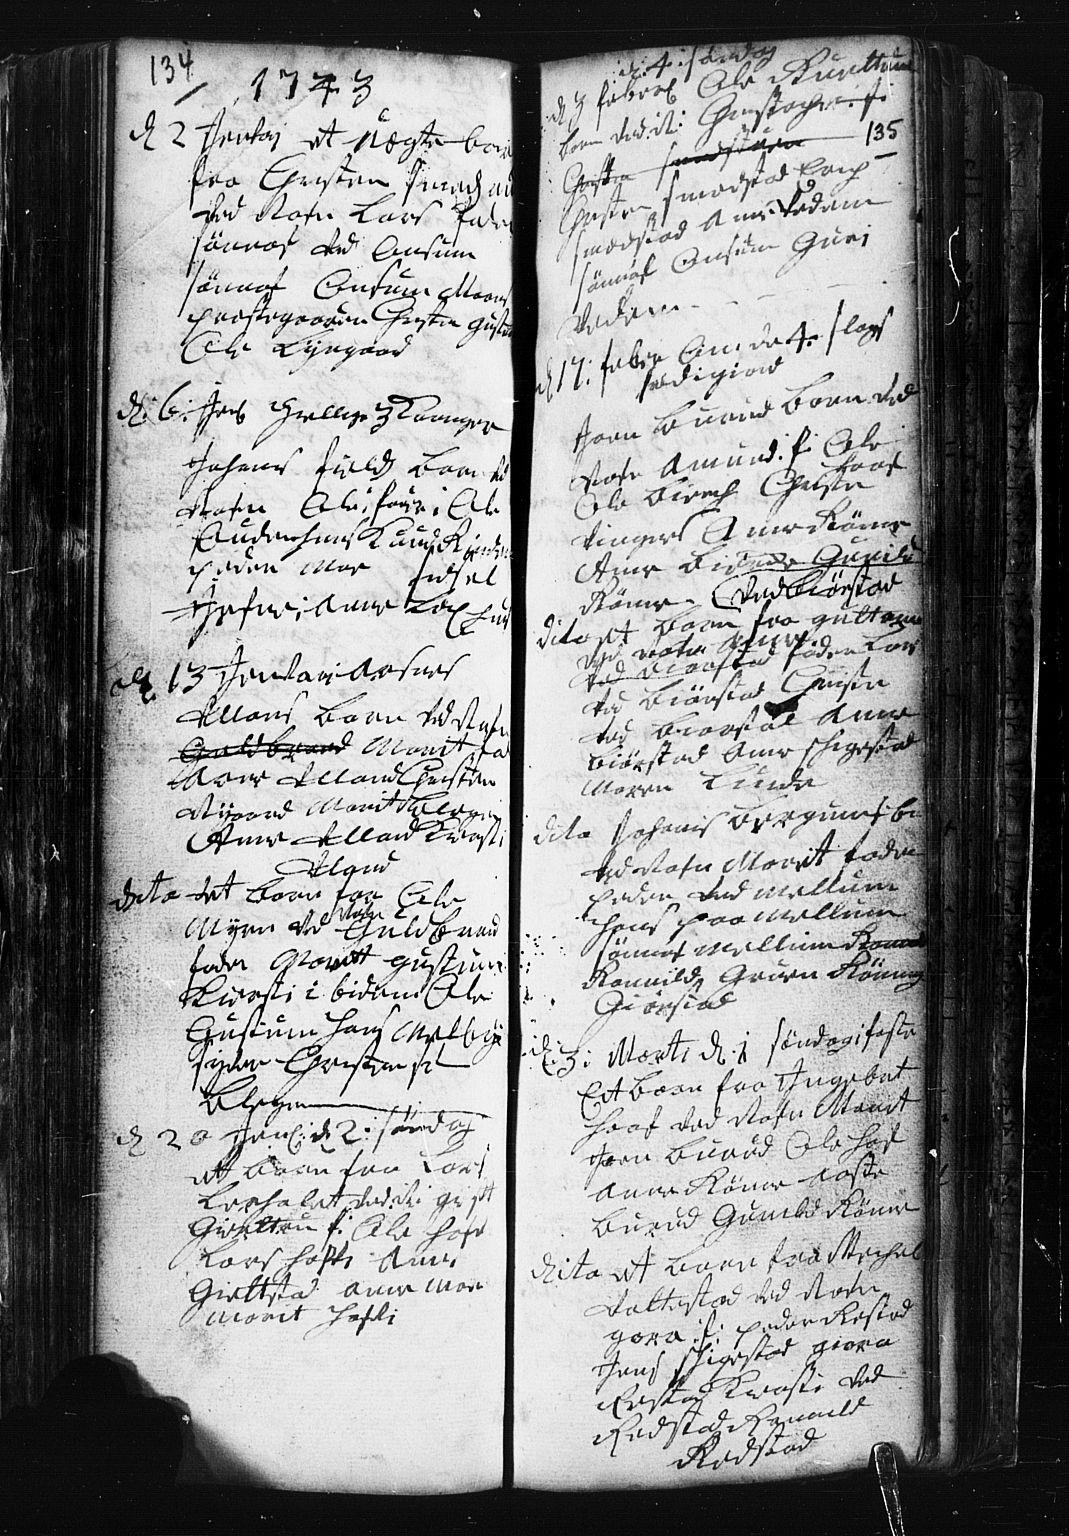 SAH, Fåberg prestekontor, Klokkerbok nr. 1, 1727-1767, s. 134-135